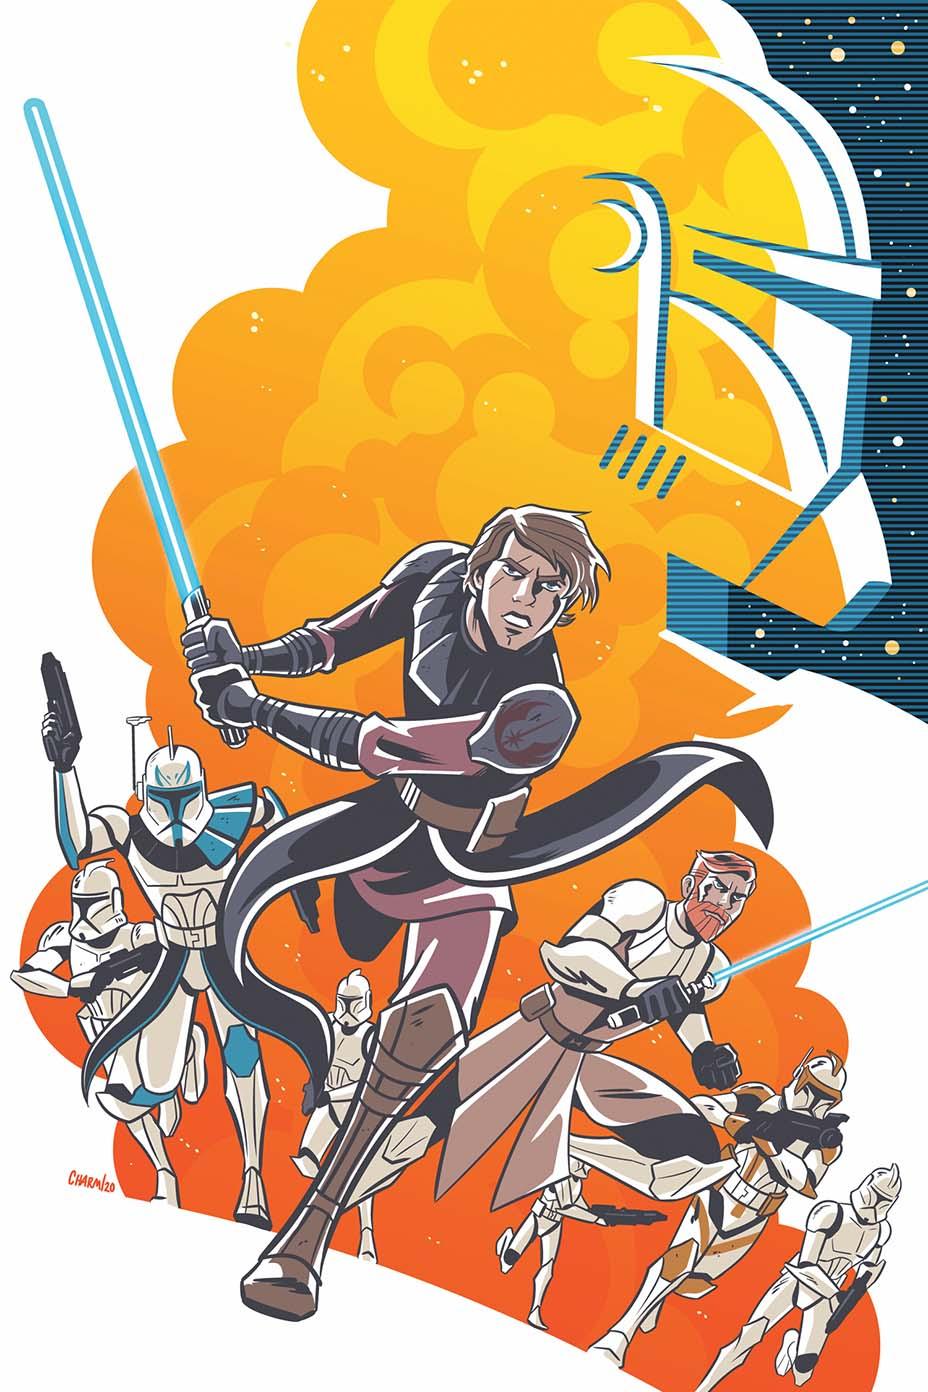 star_wars_adventures_-_clone_wars_1_-_cover_a_by_derek_charm-embed_2020